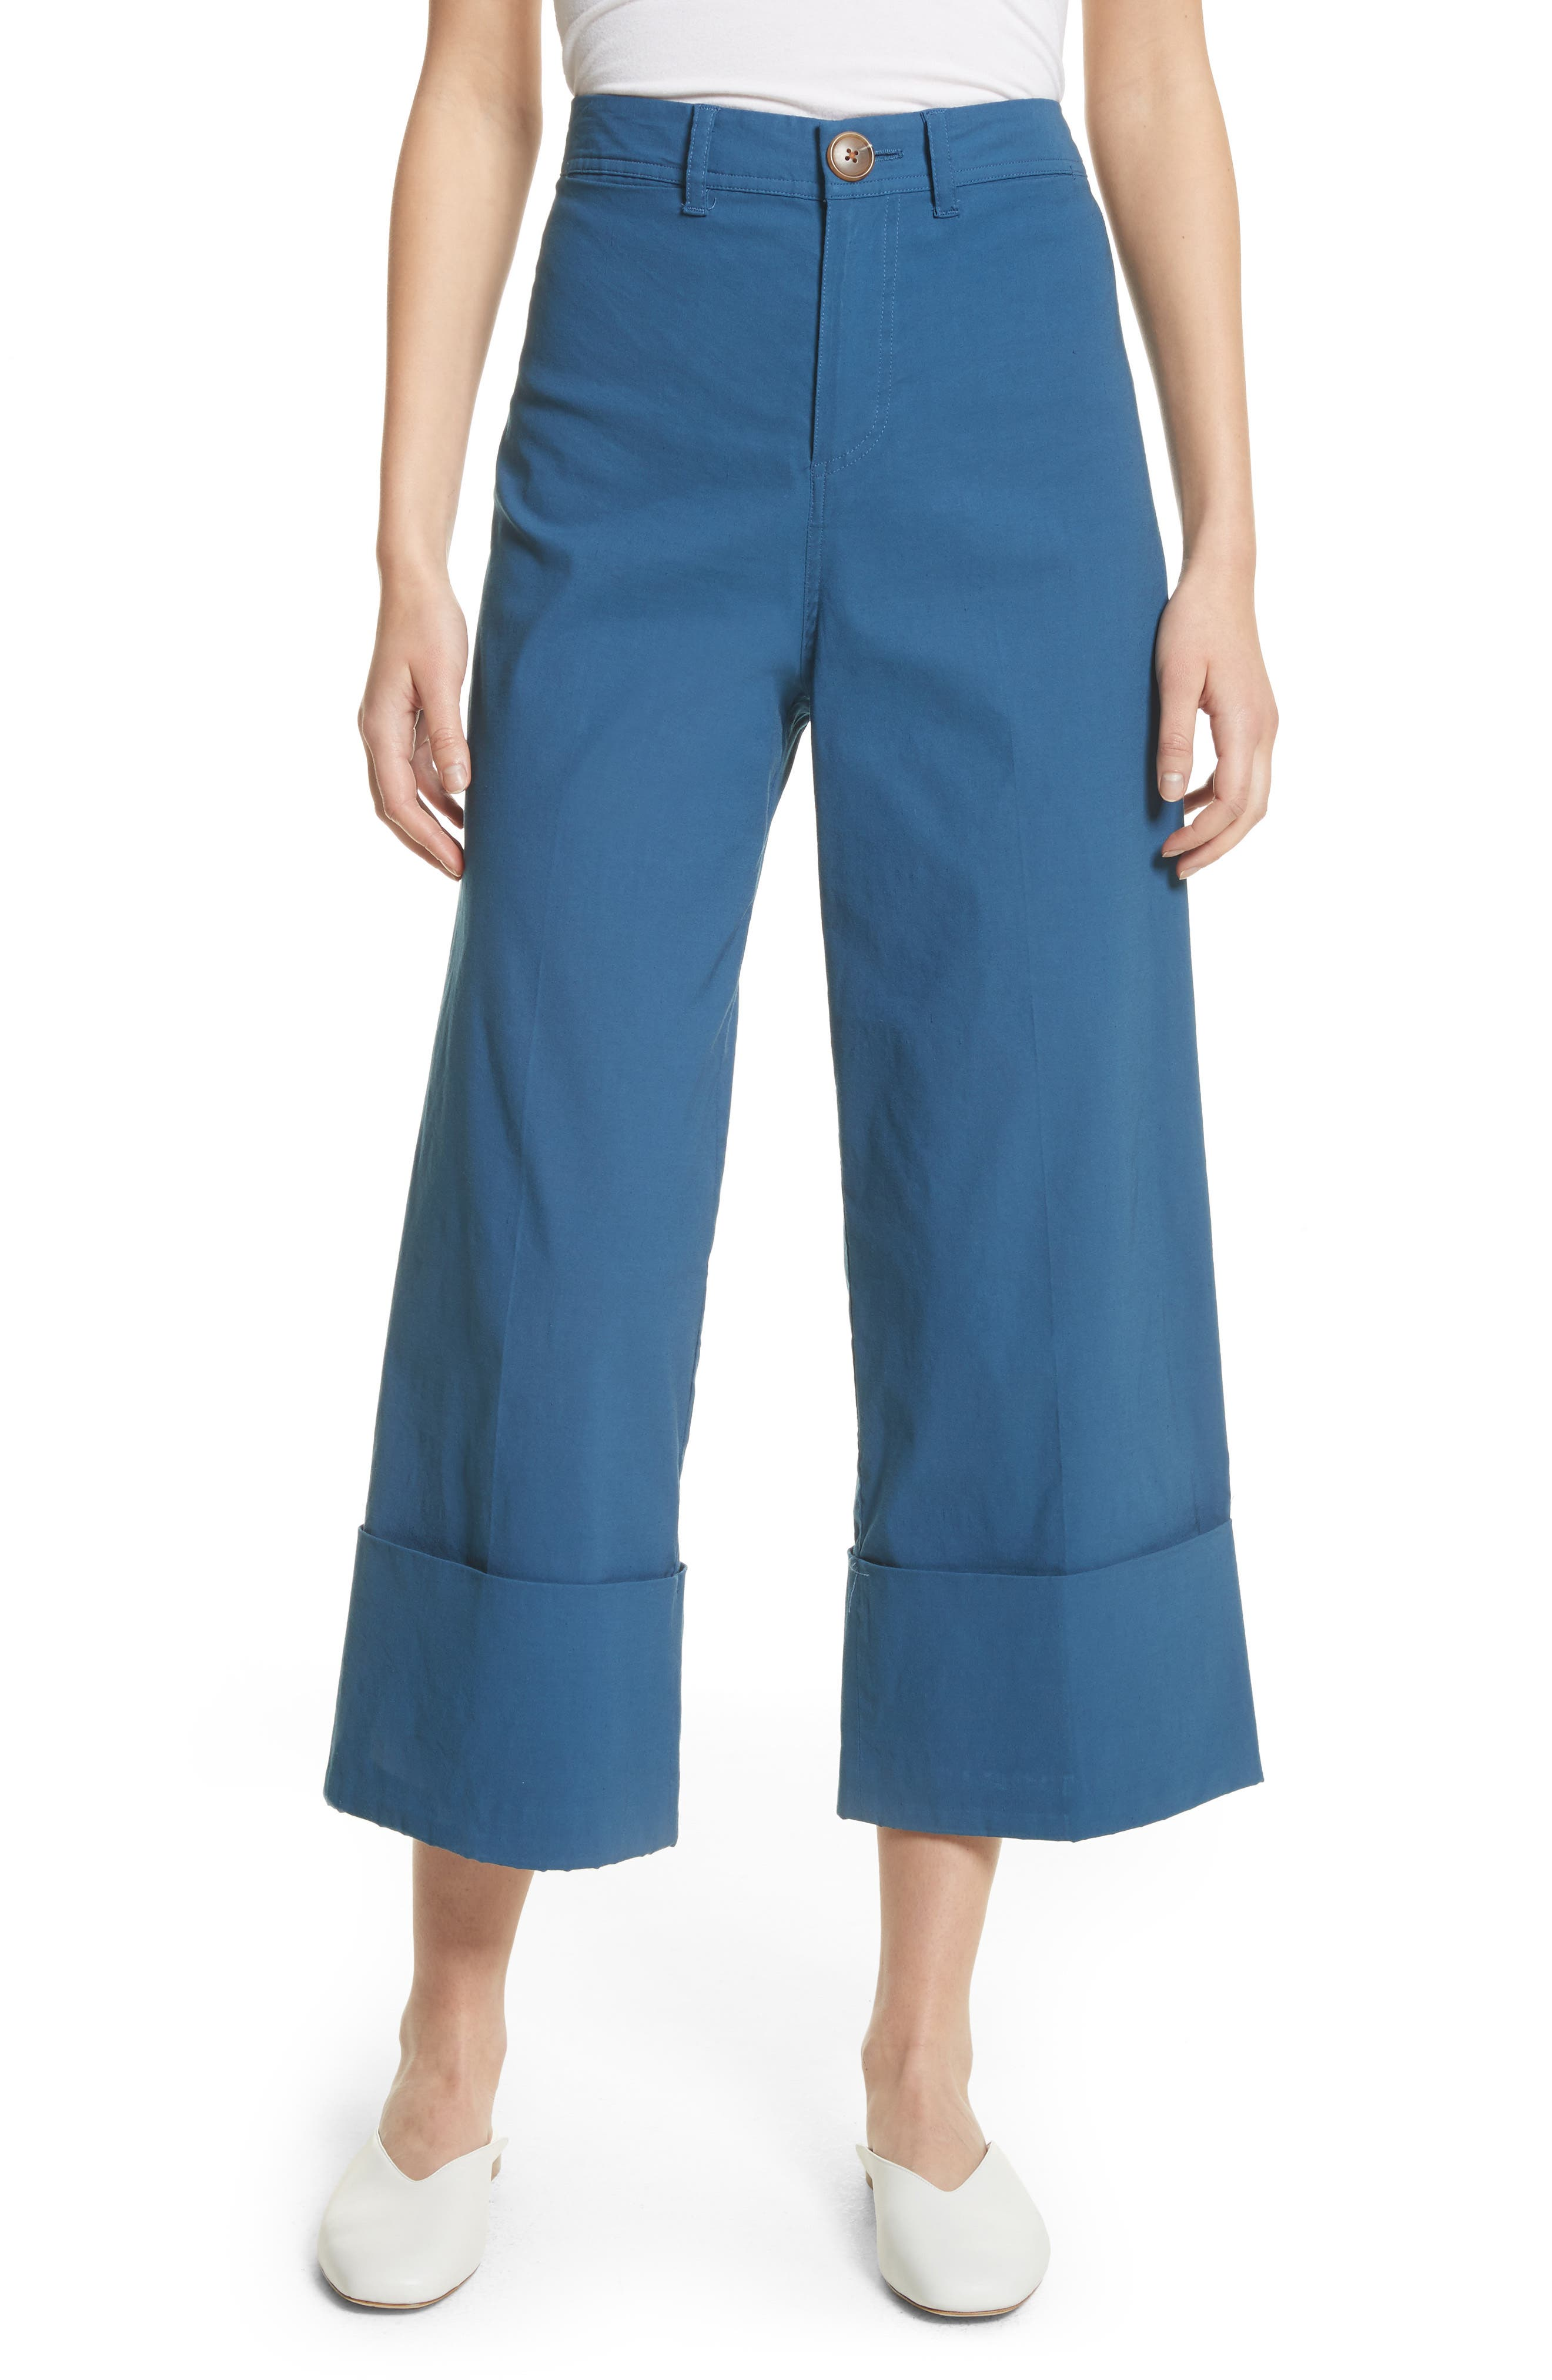 Winona Cuff Wide Leg Pants,                             Main thumbnail 1, color,                             Blue